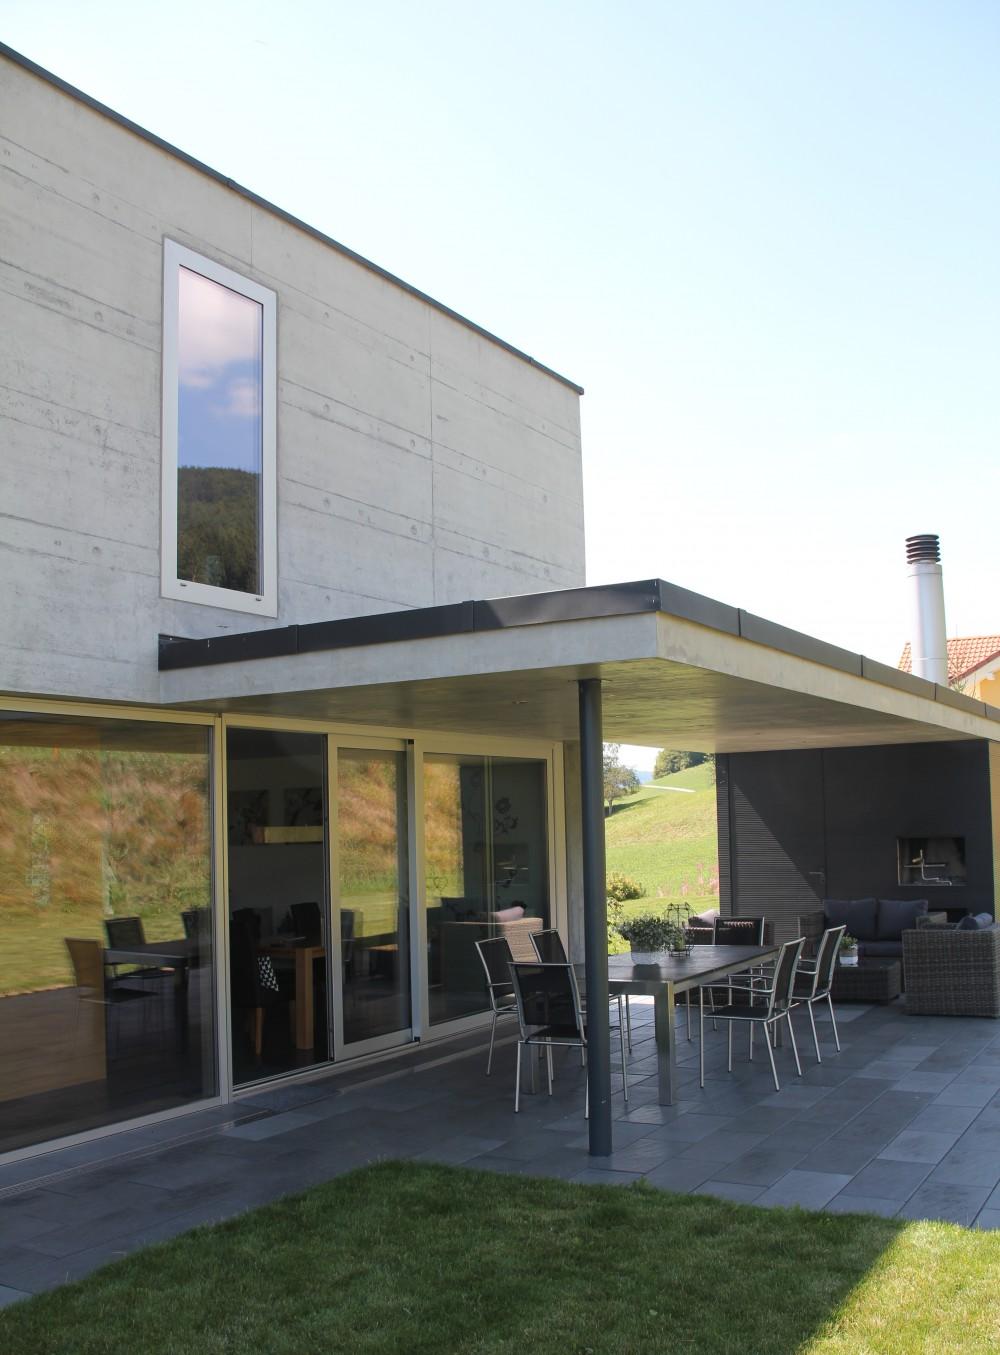 Villa-a-malleray-53-1410-7